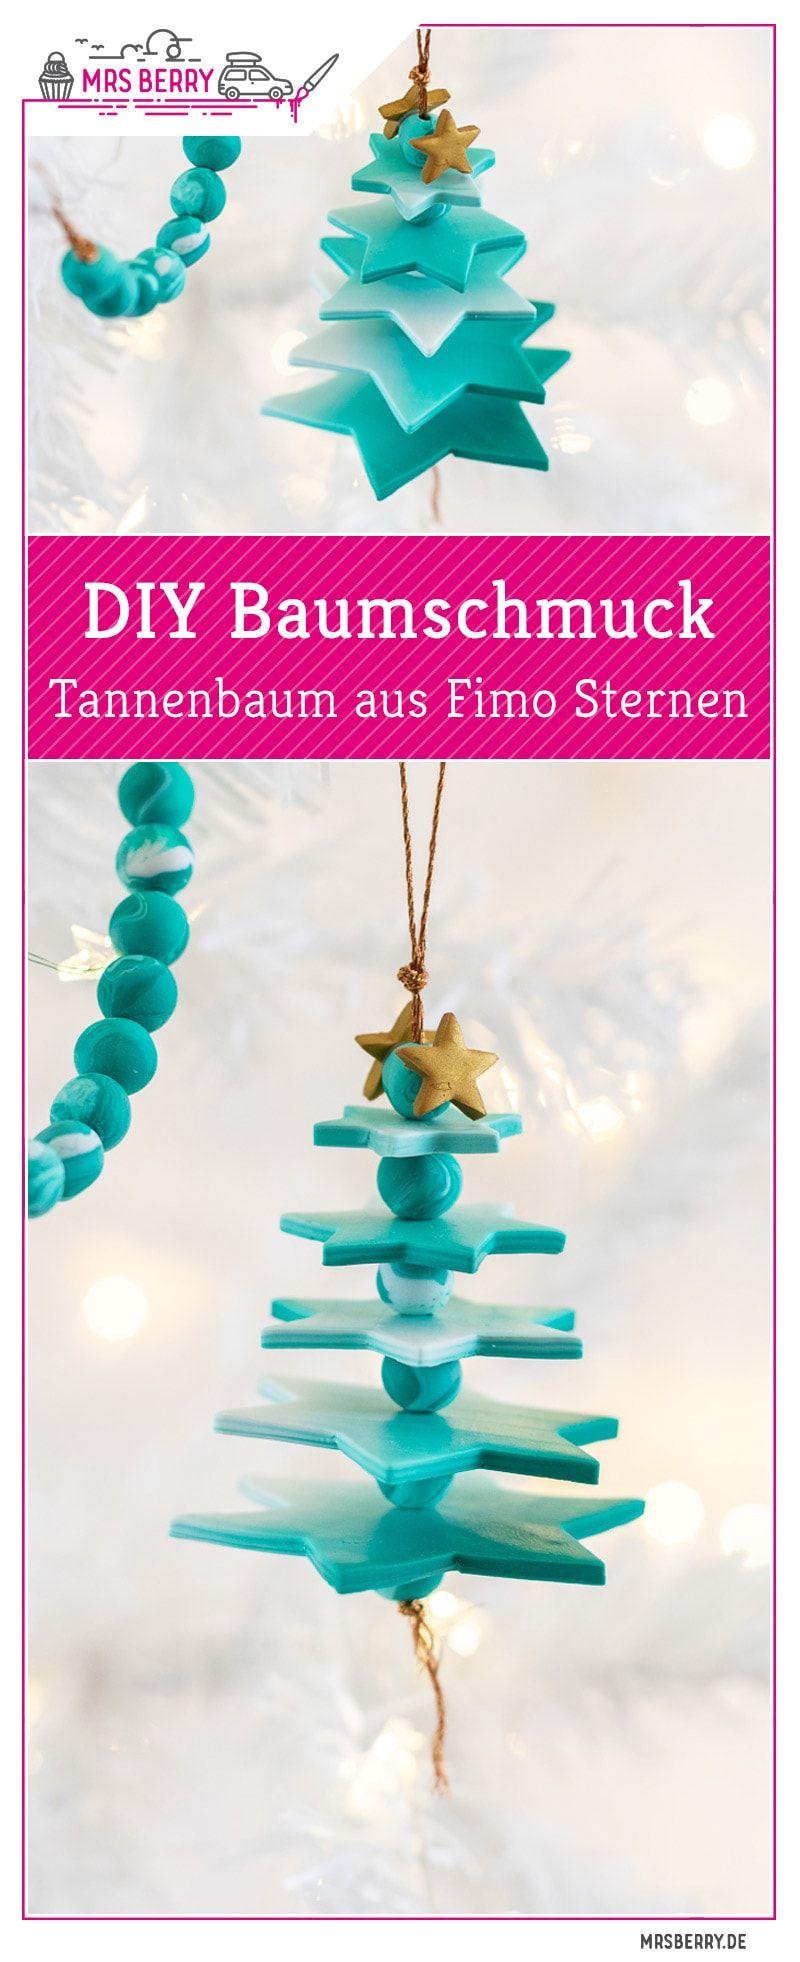 DIY Baumschmuck: Tannenbaum aus Fimo Sternen | MrsBerry.de #christbaumschmuckbastelnkinder